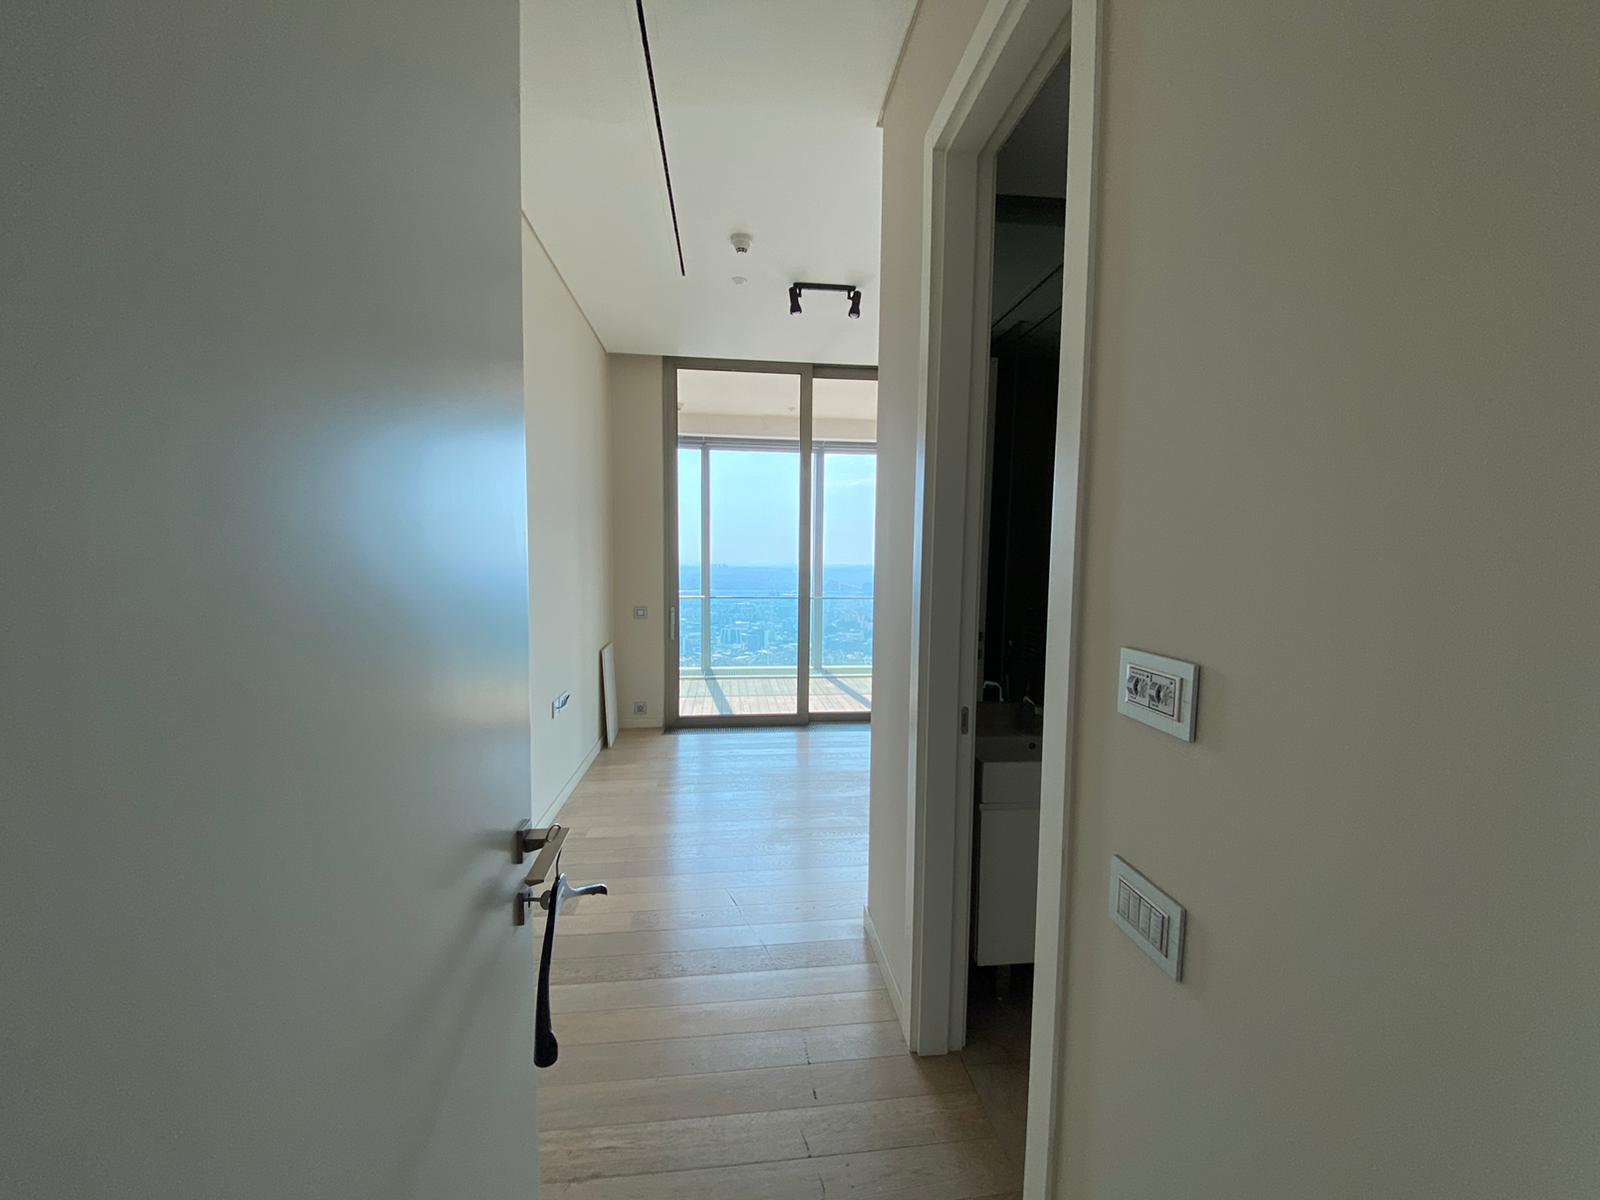 penthouse-istanbul-sapphire-tower-014-1.jpg